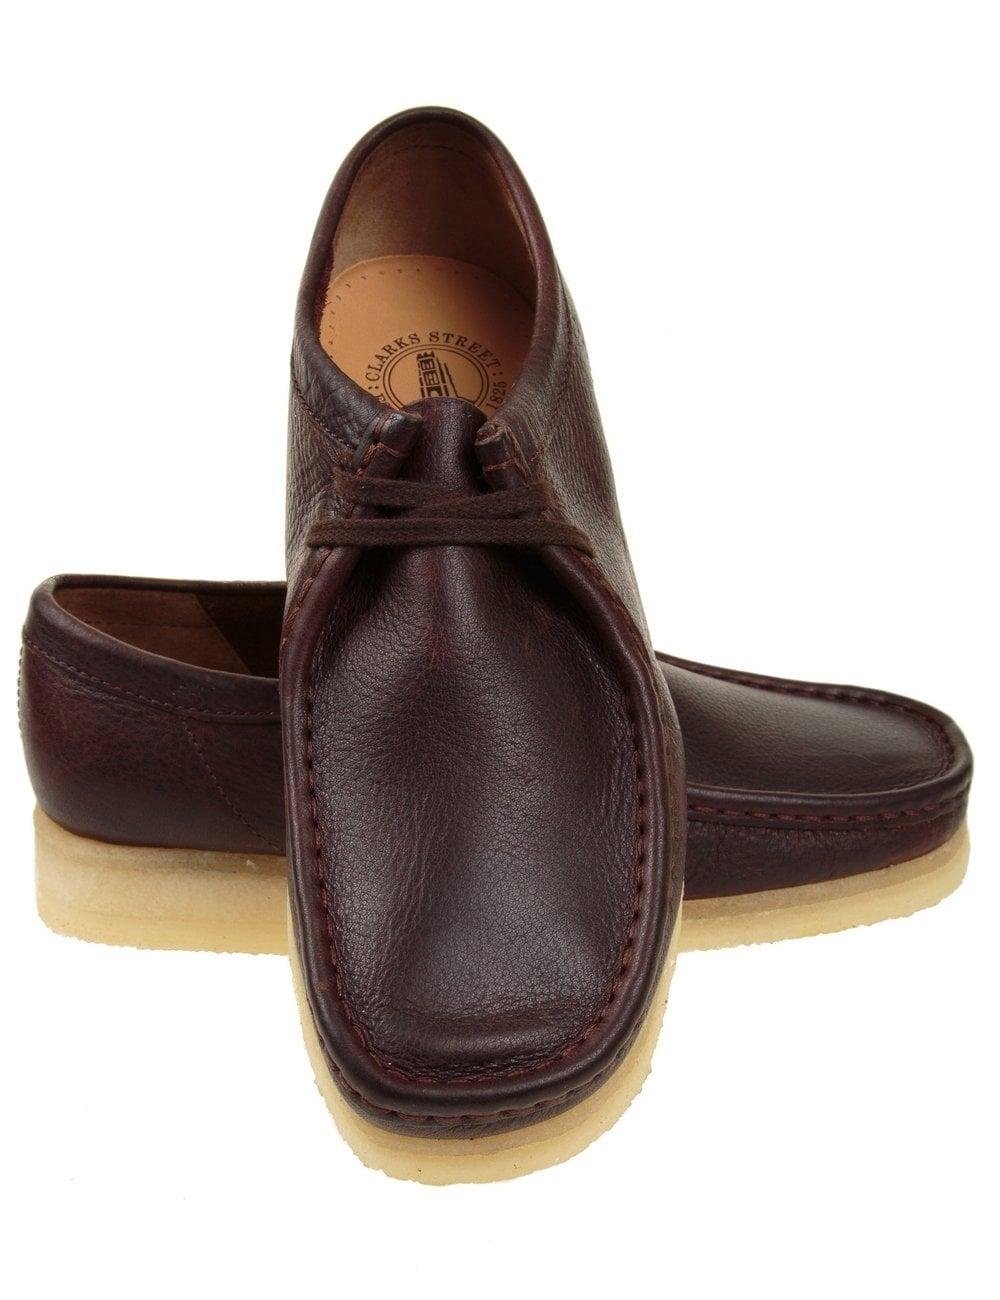 clarks originals wallabee shoe brown leather clarks originals from. Black Bedroom Furniture Sets. Home Design Ideas